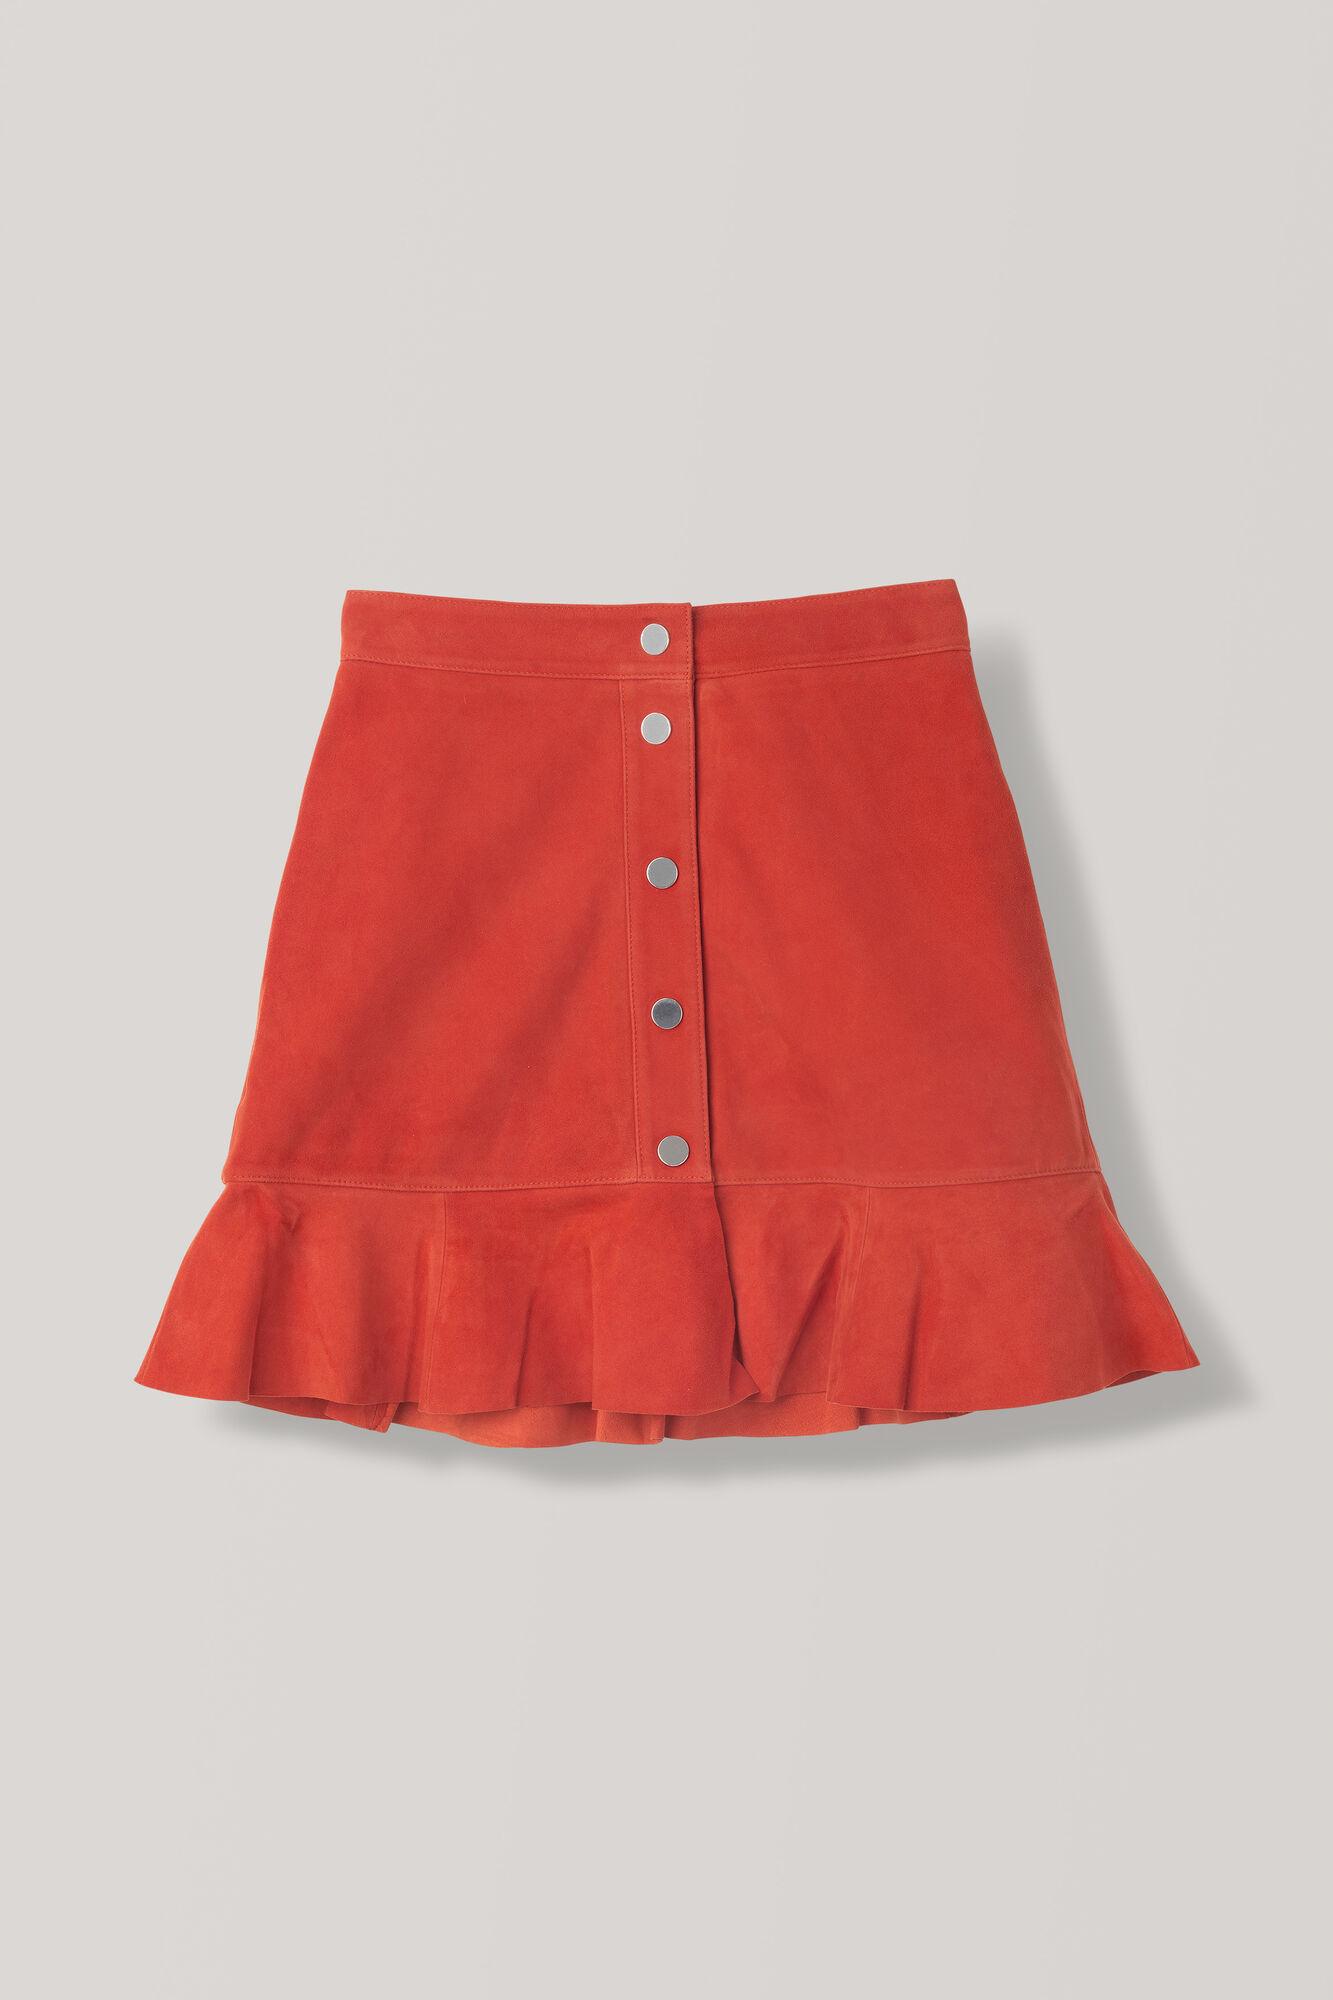 Salvia Skirt, Big Apple Red, hi-res